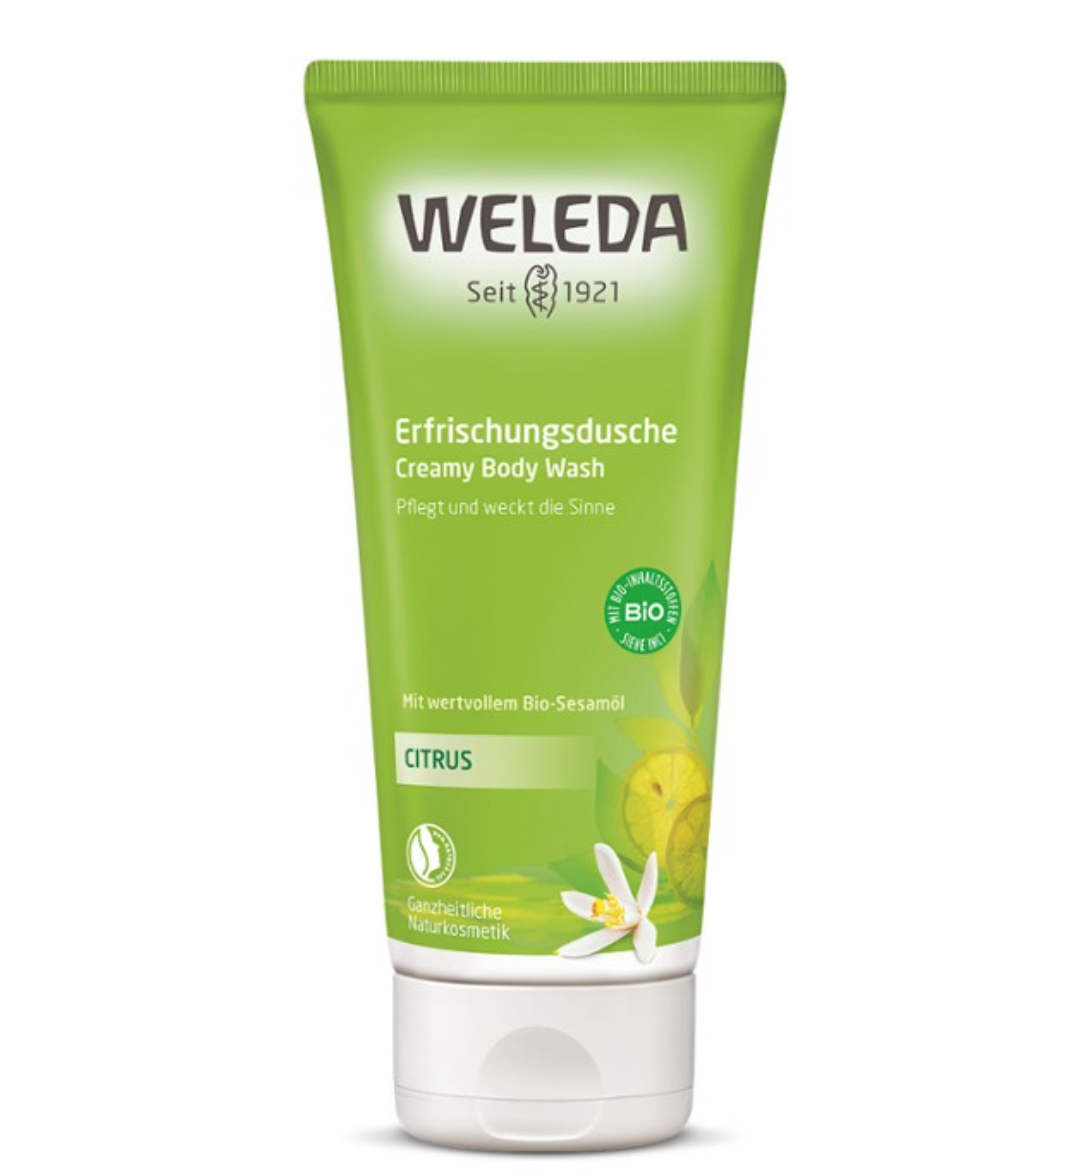 Creamy Body Wash Citrus 200ml Weleda